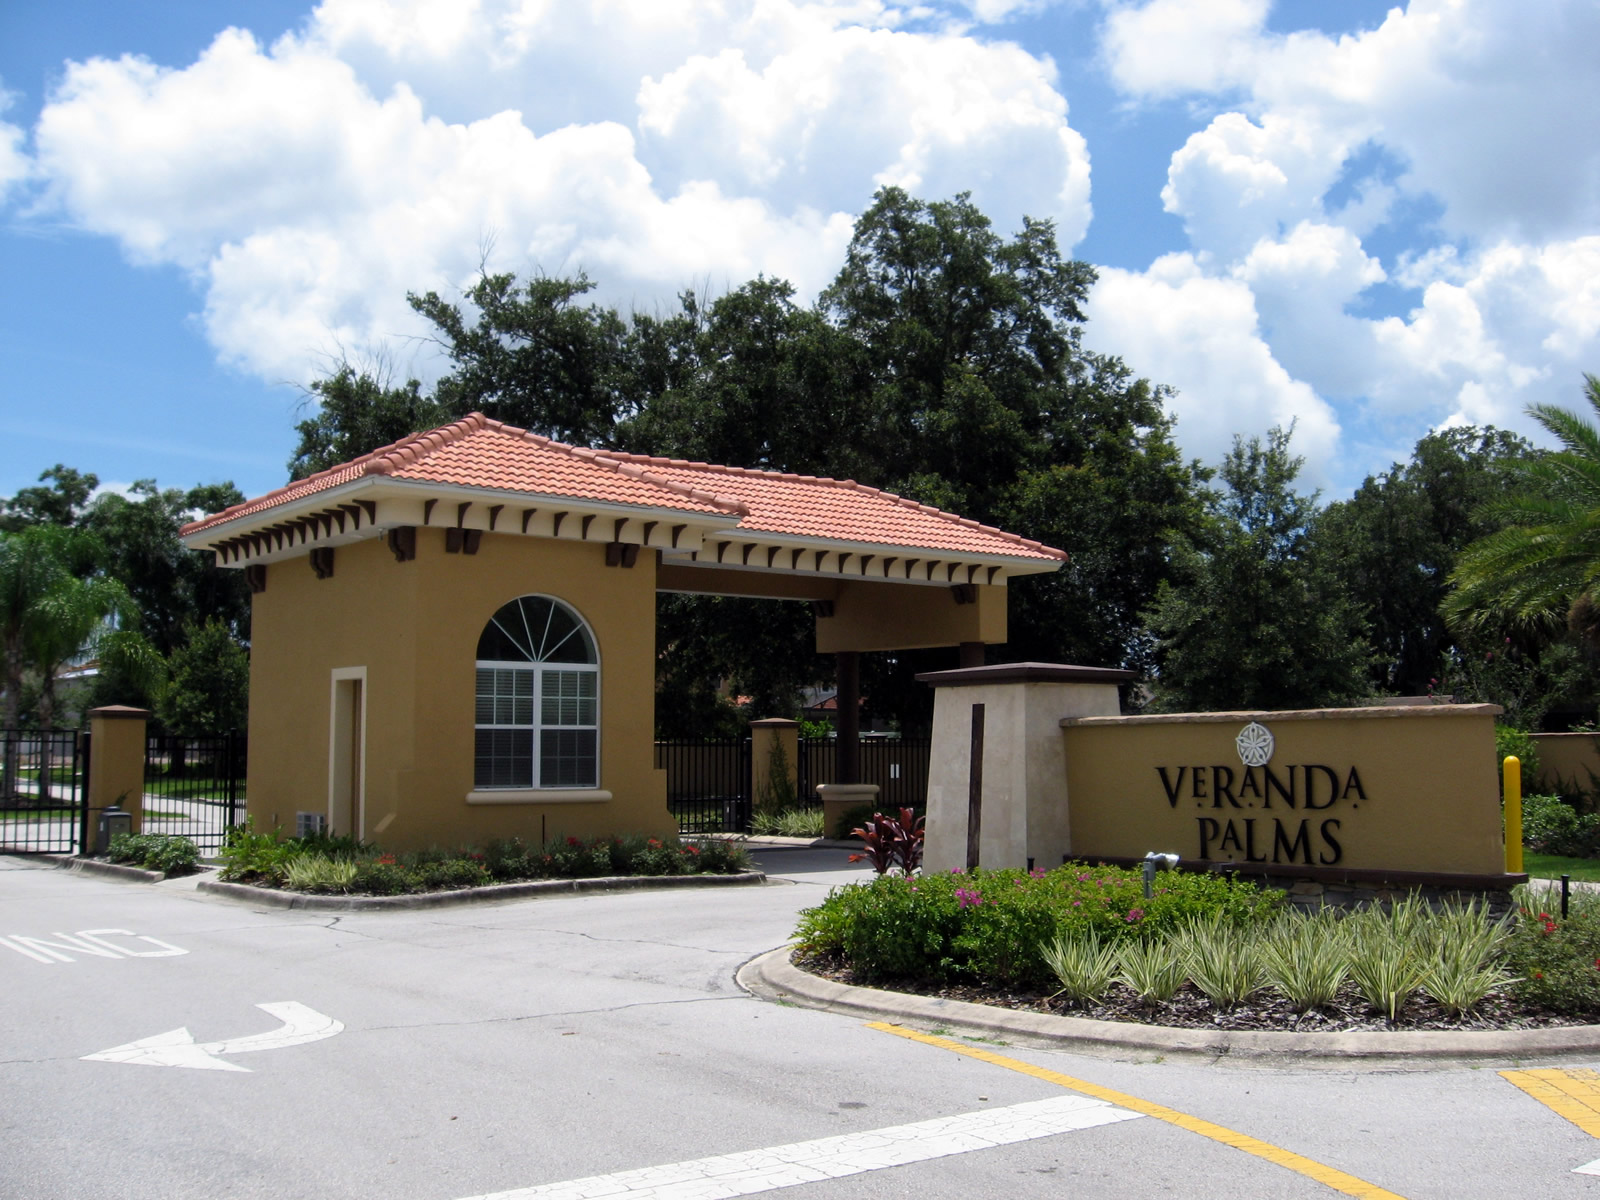 Veranda Palms Main Image